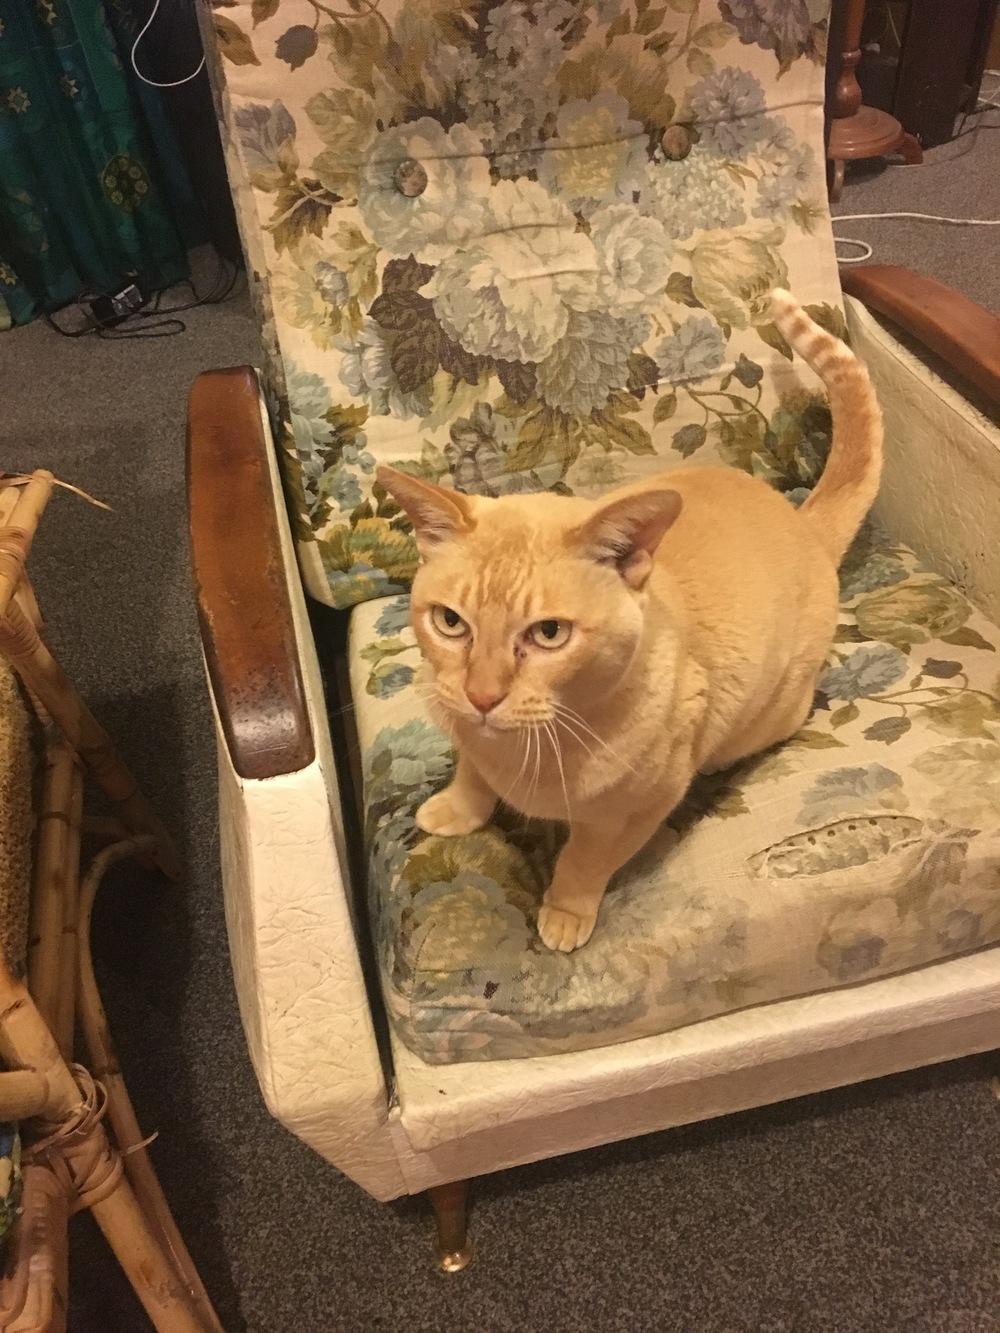 Cat Sitting. Meet Hobo!